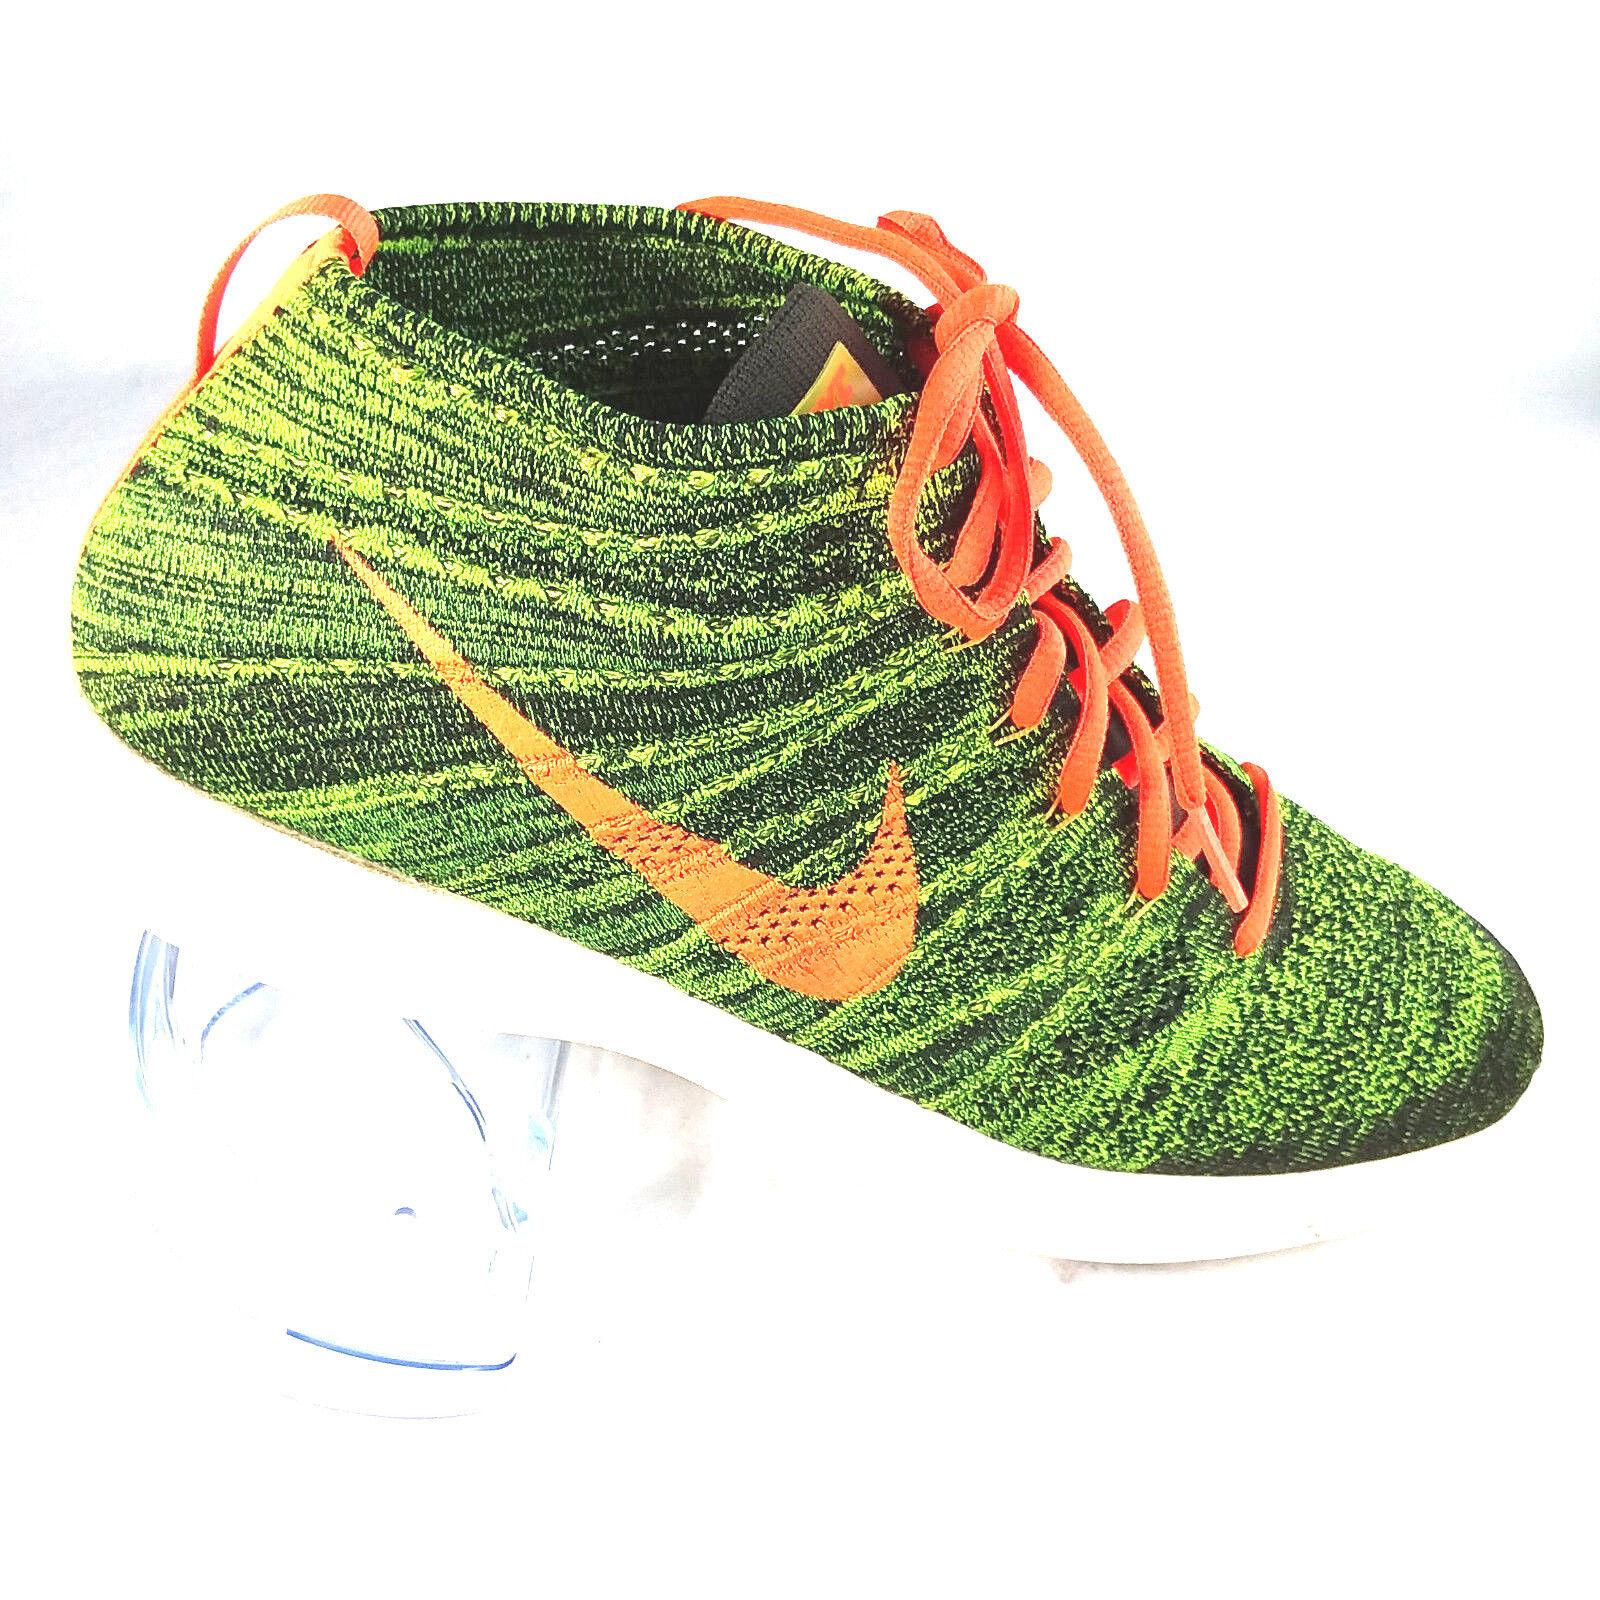 Nike Mens Flyknit Lunarlon Chukka Sequoia orange Green Size 14 554969-080